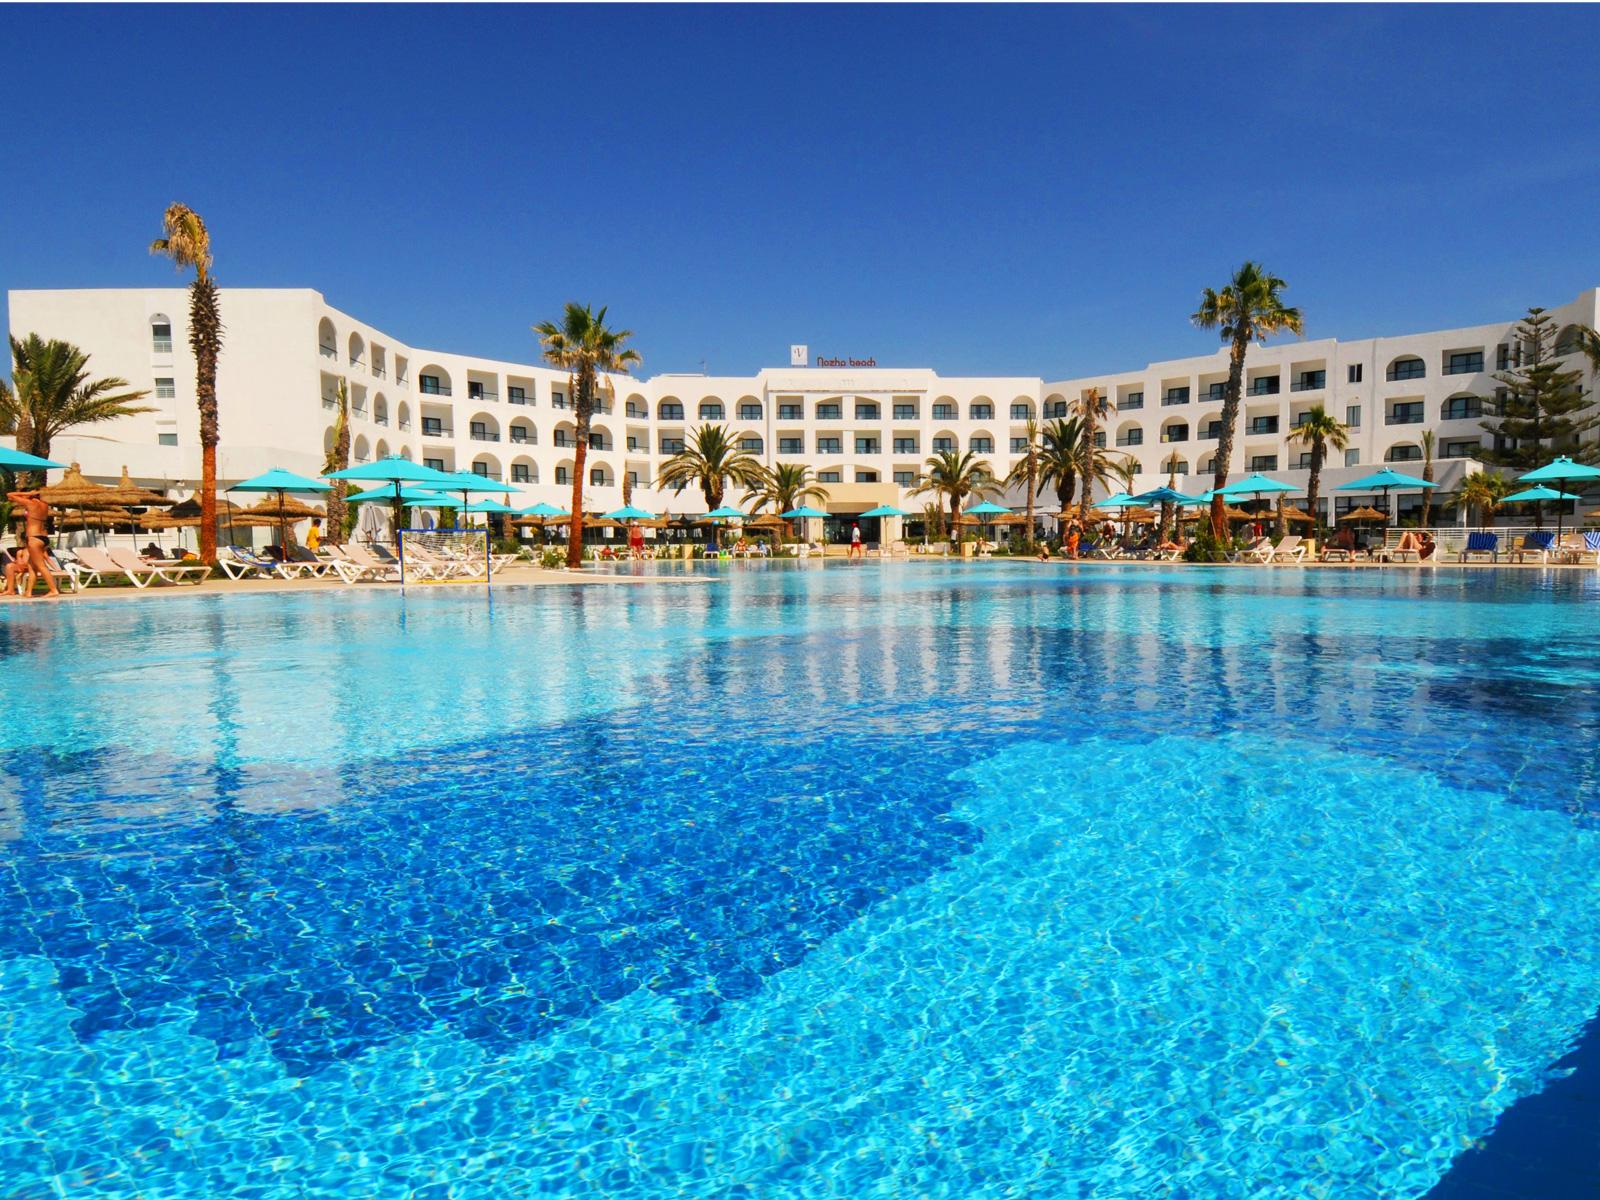 Piscine Extérieure - Hamammet Nozha Beach Hotel